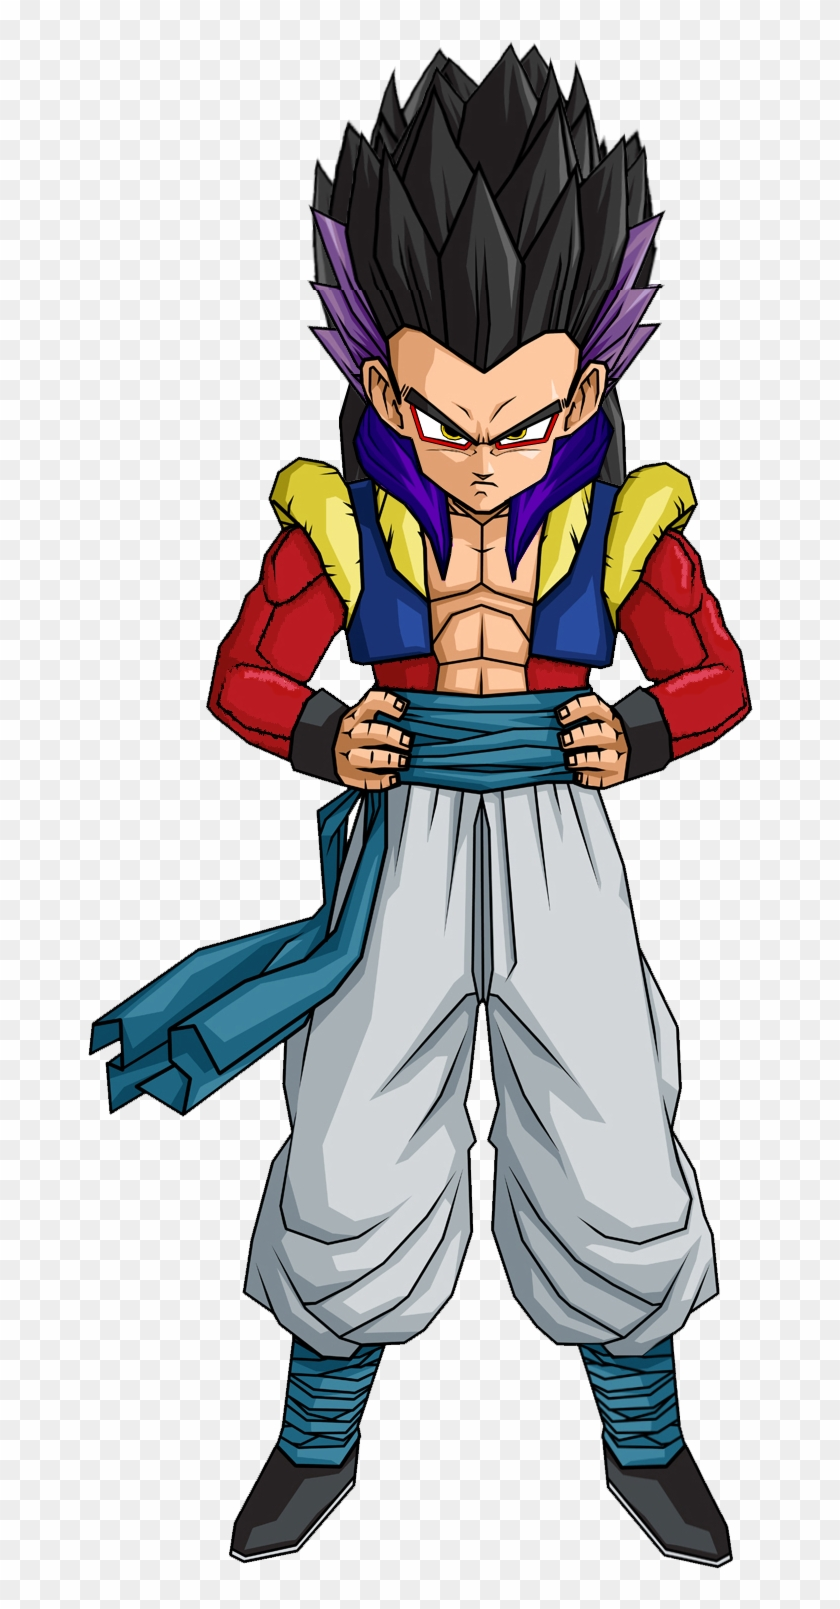 Gotenks Super Saiyan Dragon Ball Goten Ssj4 Hd Png Download 1200x1600 238260 Pngfind